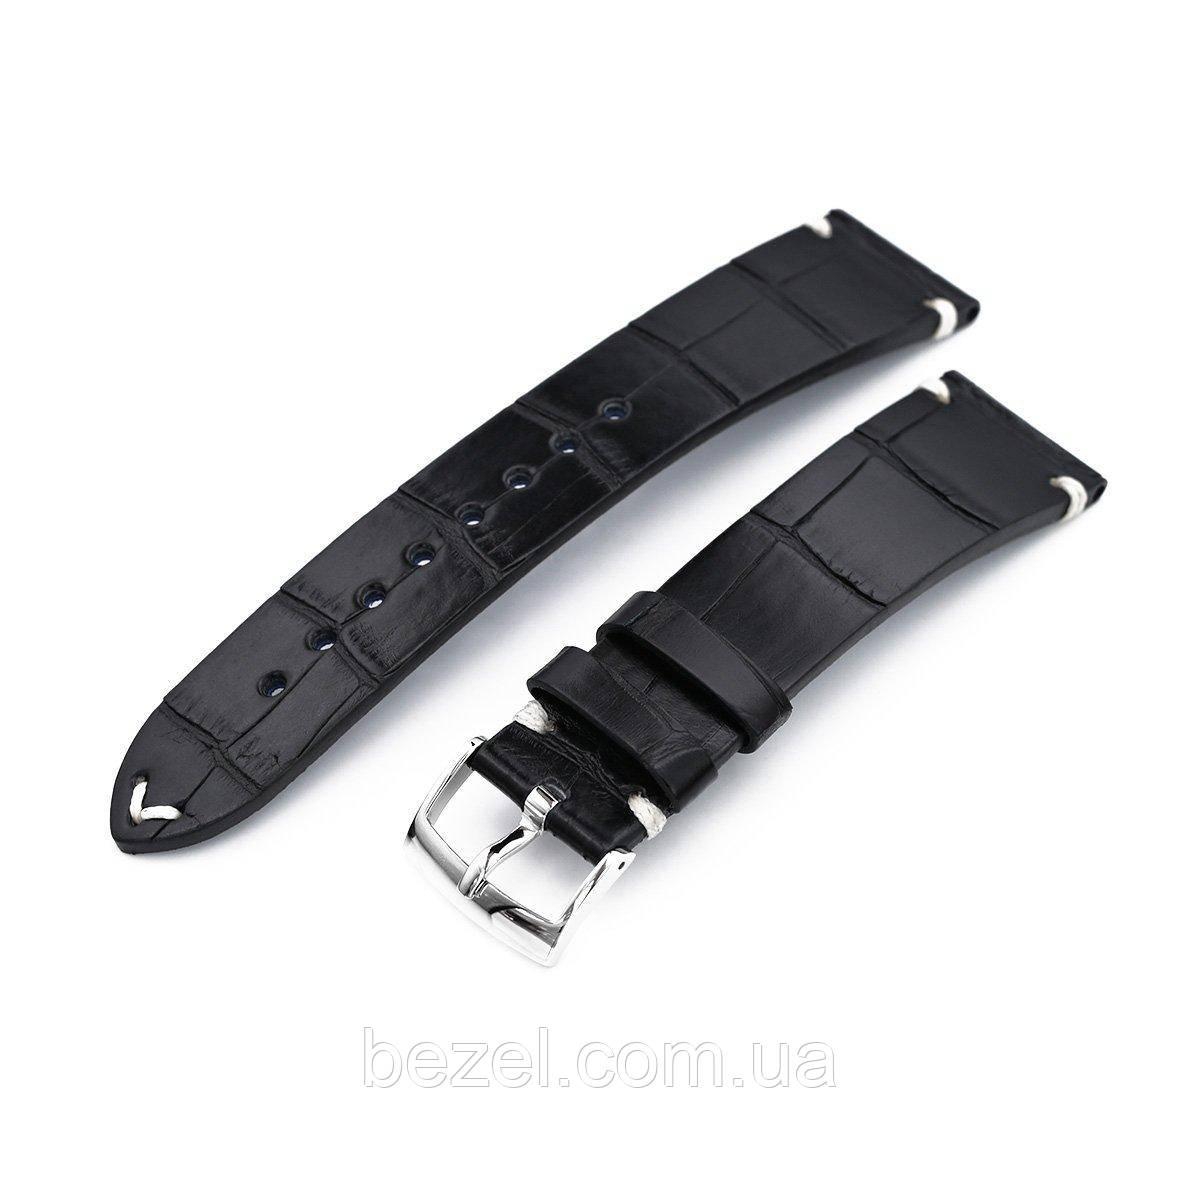 20mm, 21mm or 22mm MiLTAT Genuine American Alligator Square Scale, Semi Matte Black Watch Strap